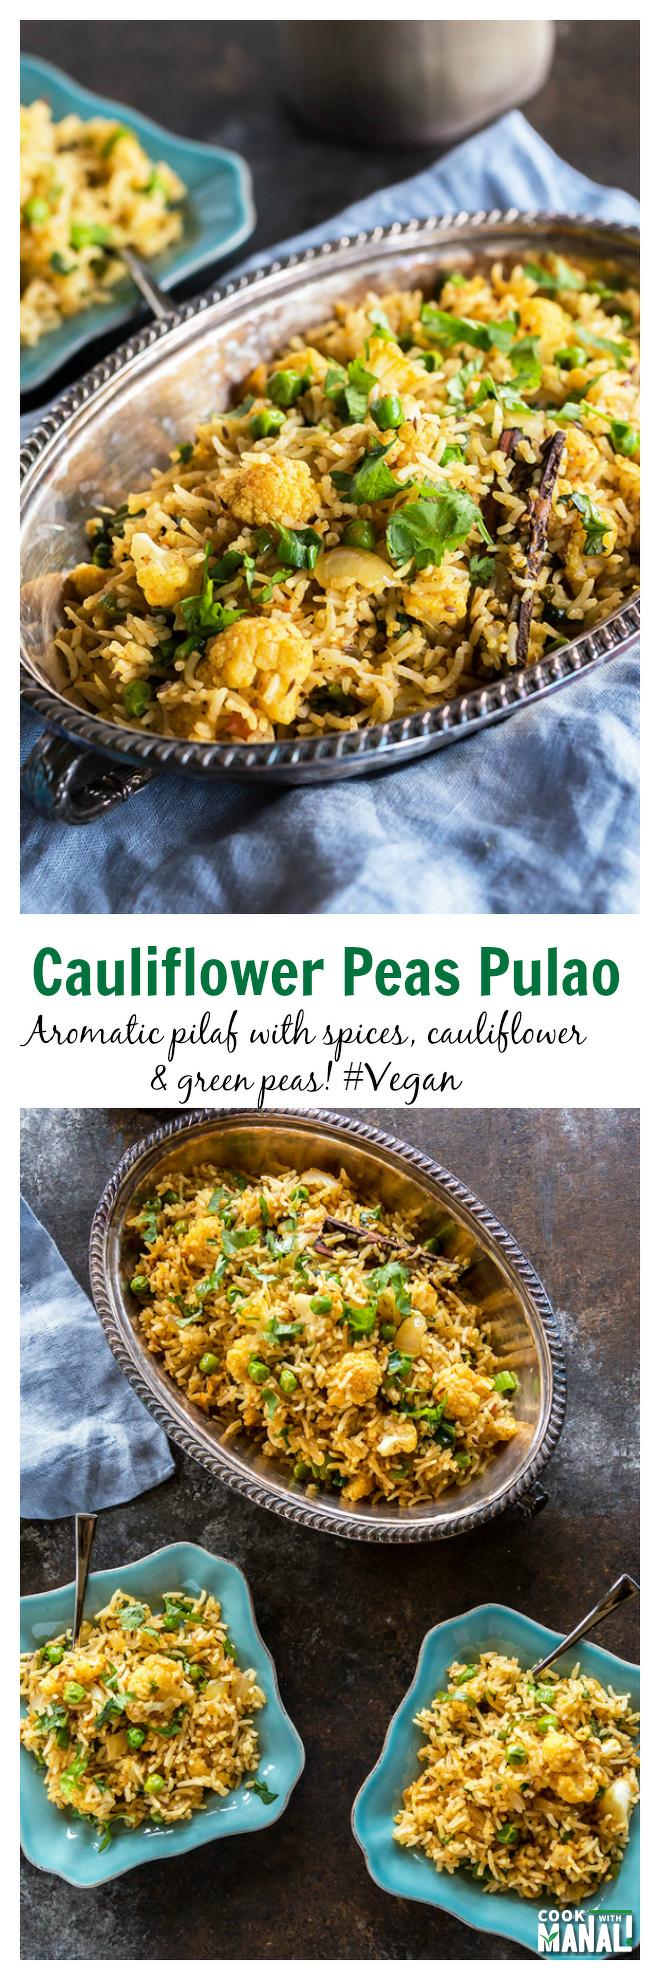 Cauliflower Peas Pulao Collage